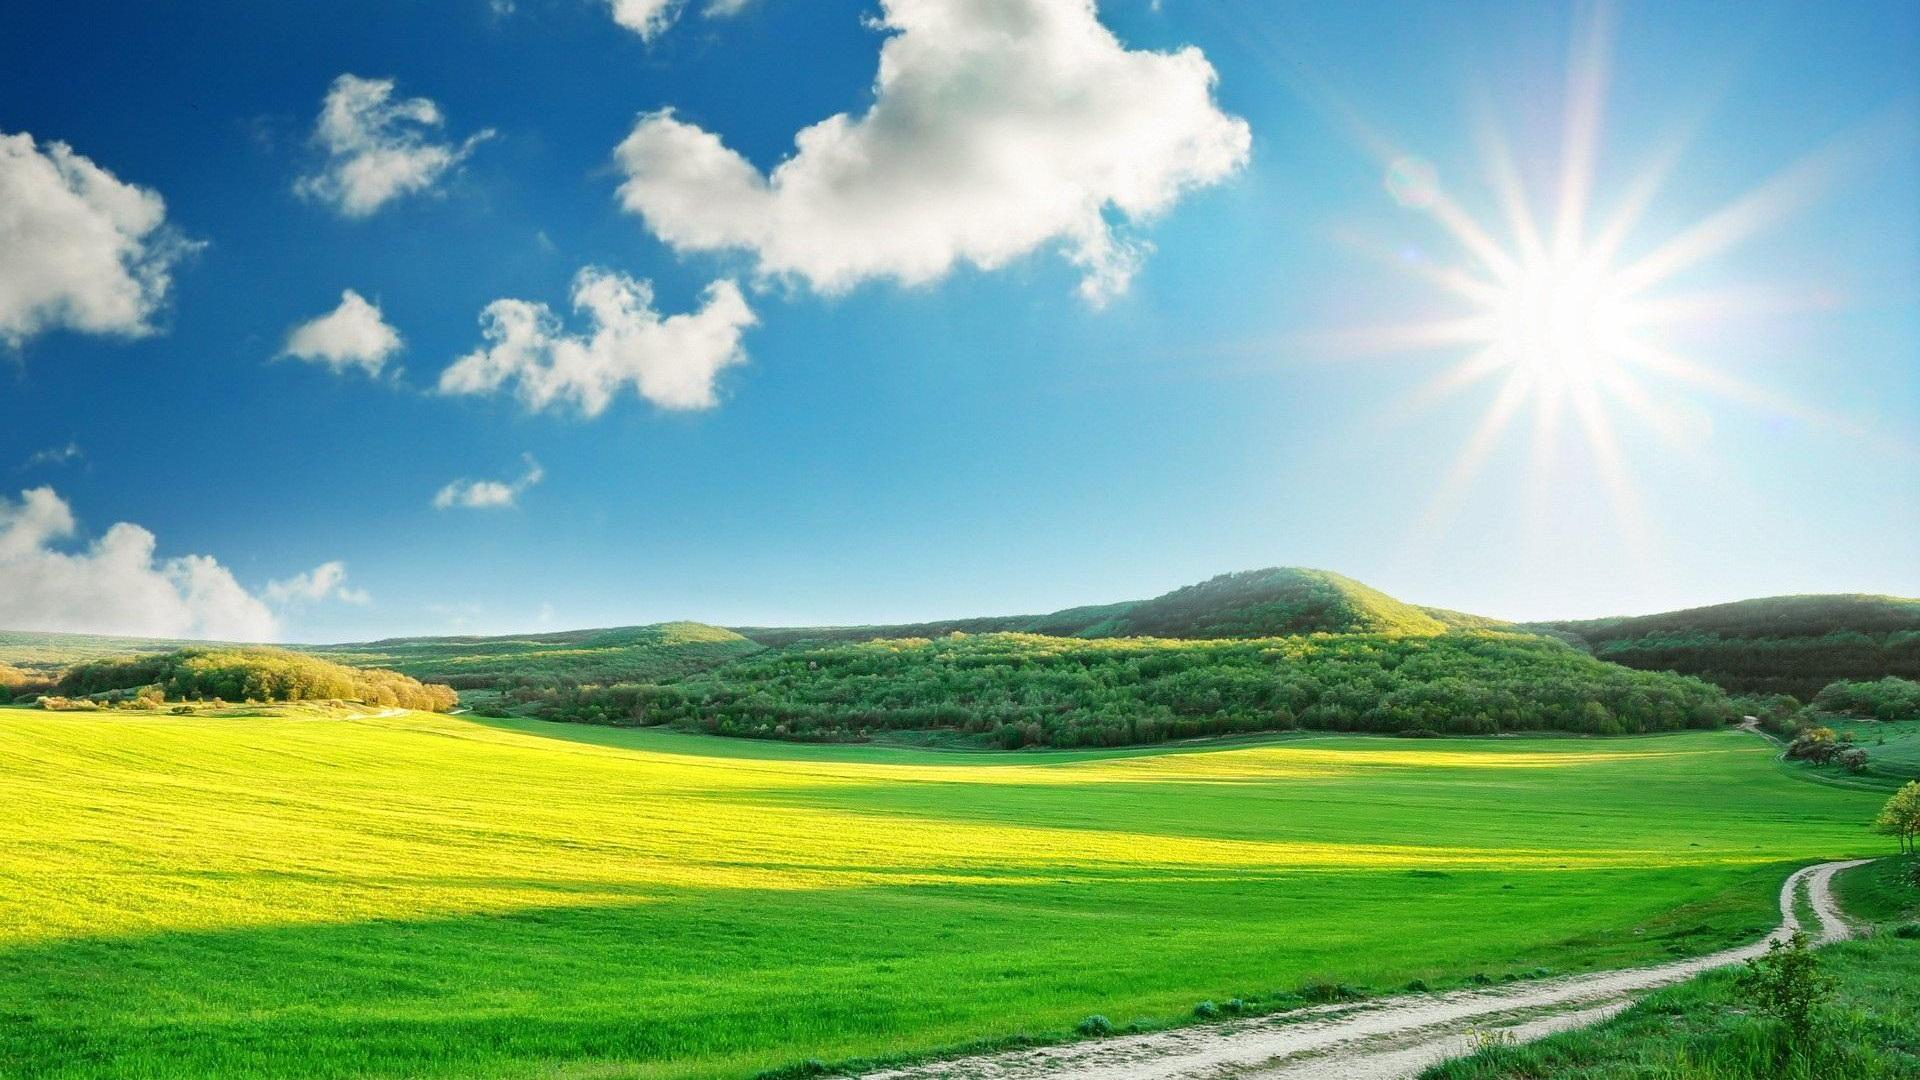 Amazing Sunny Day wallpaper 1920x1080 28942 1920x1080